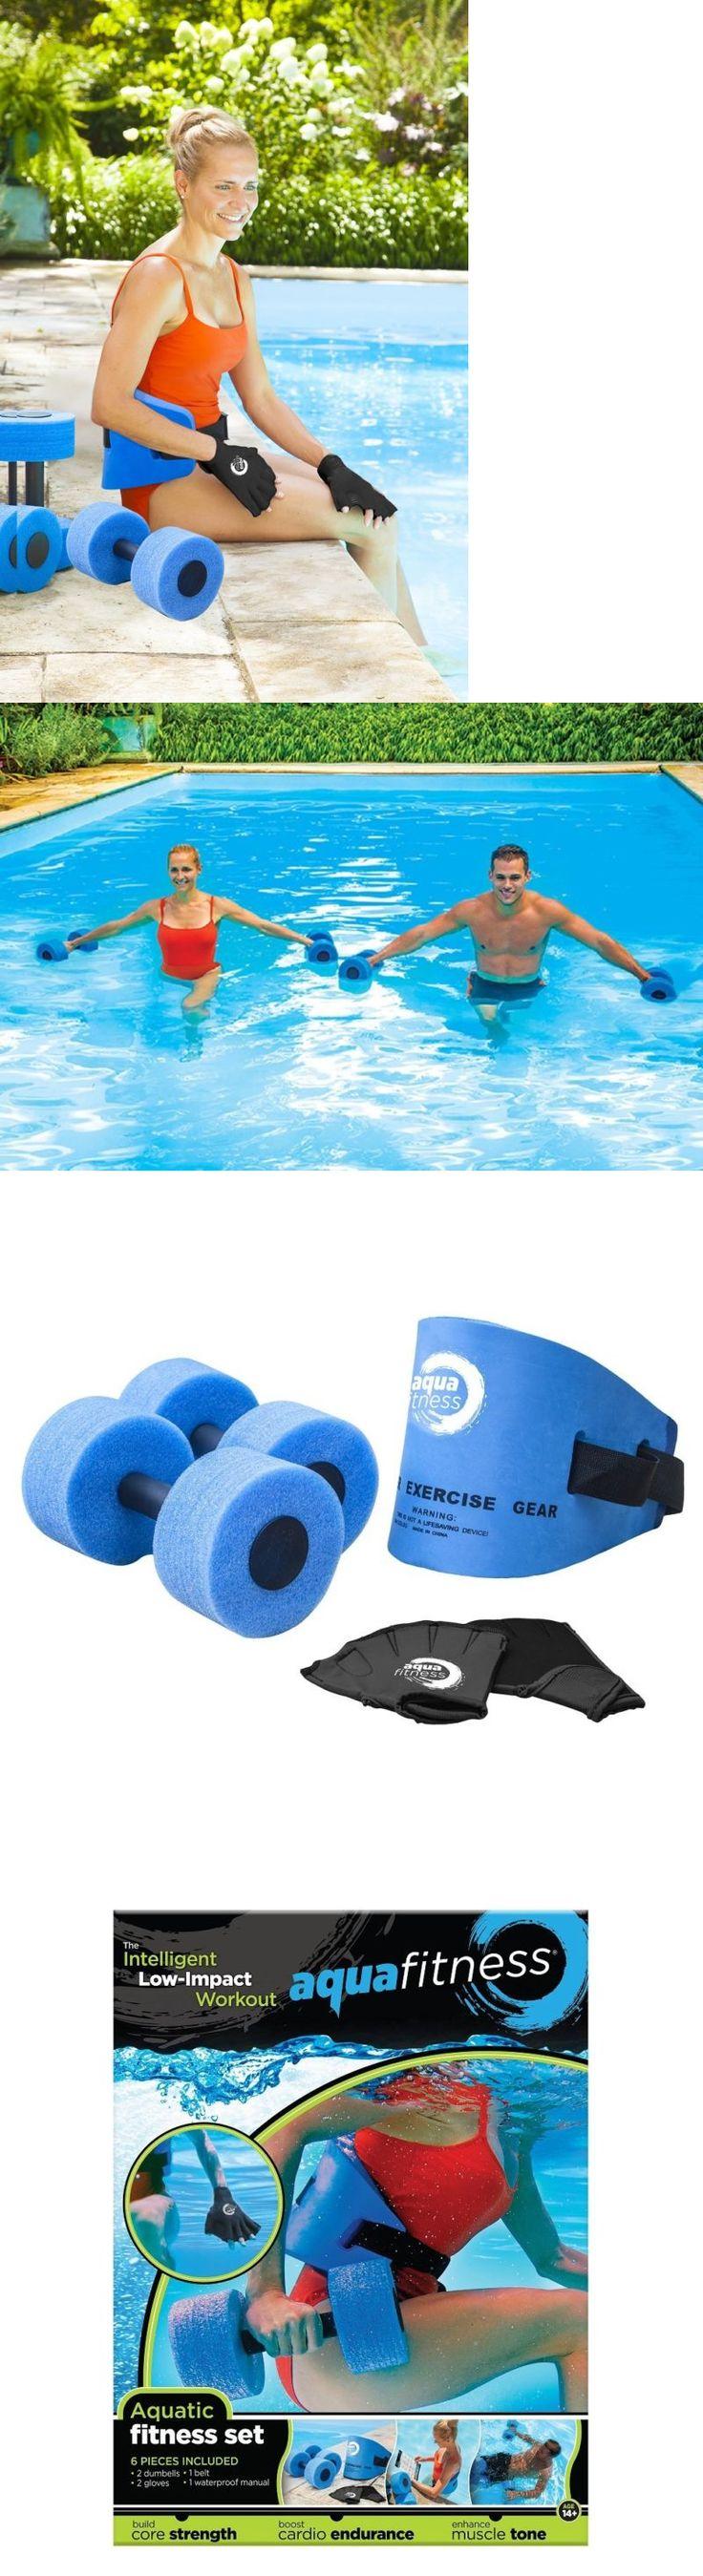 Aquatic Fitness Equipment 158922: Water Aerobics Workout Fitness Exercise Swim Flotation Belt Dumbbells Gloves New -> BUY IT NOW ONLY: $37.77 on eBay!